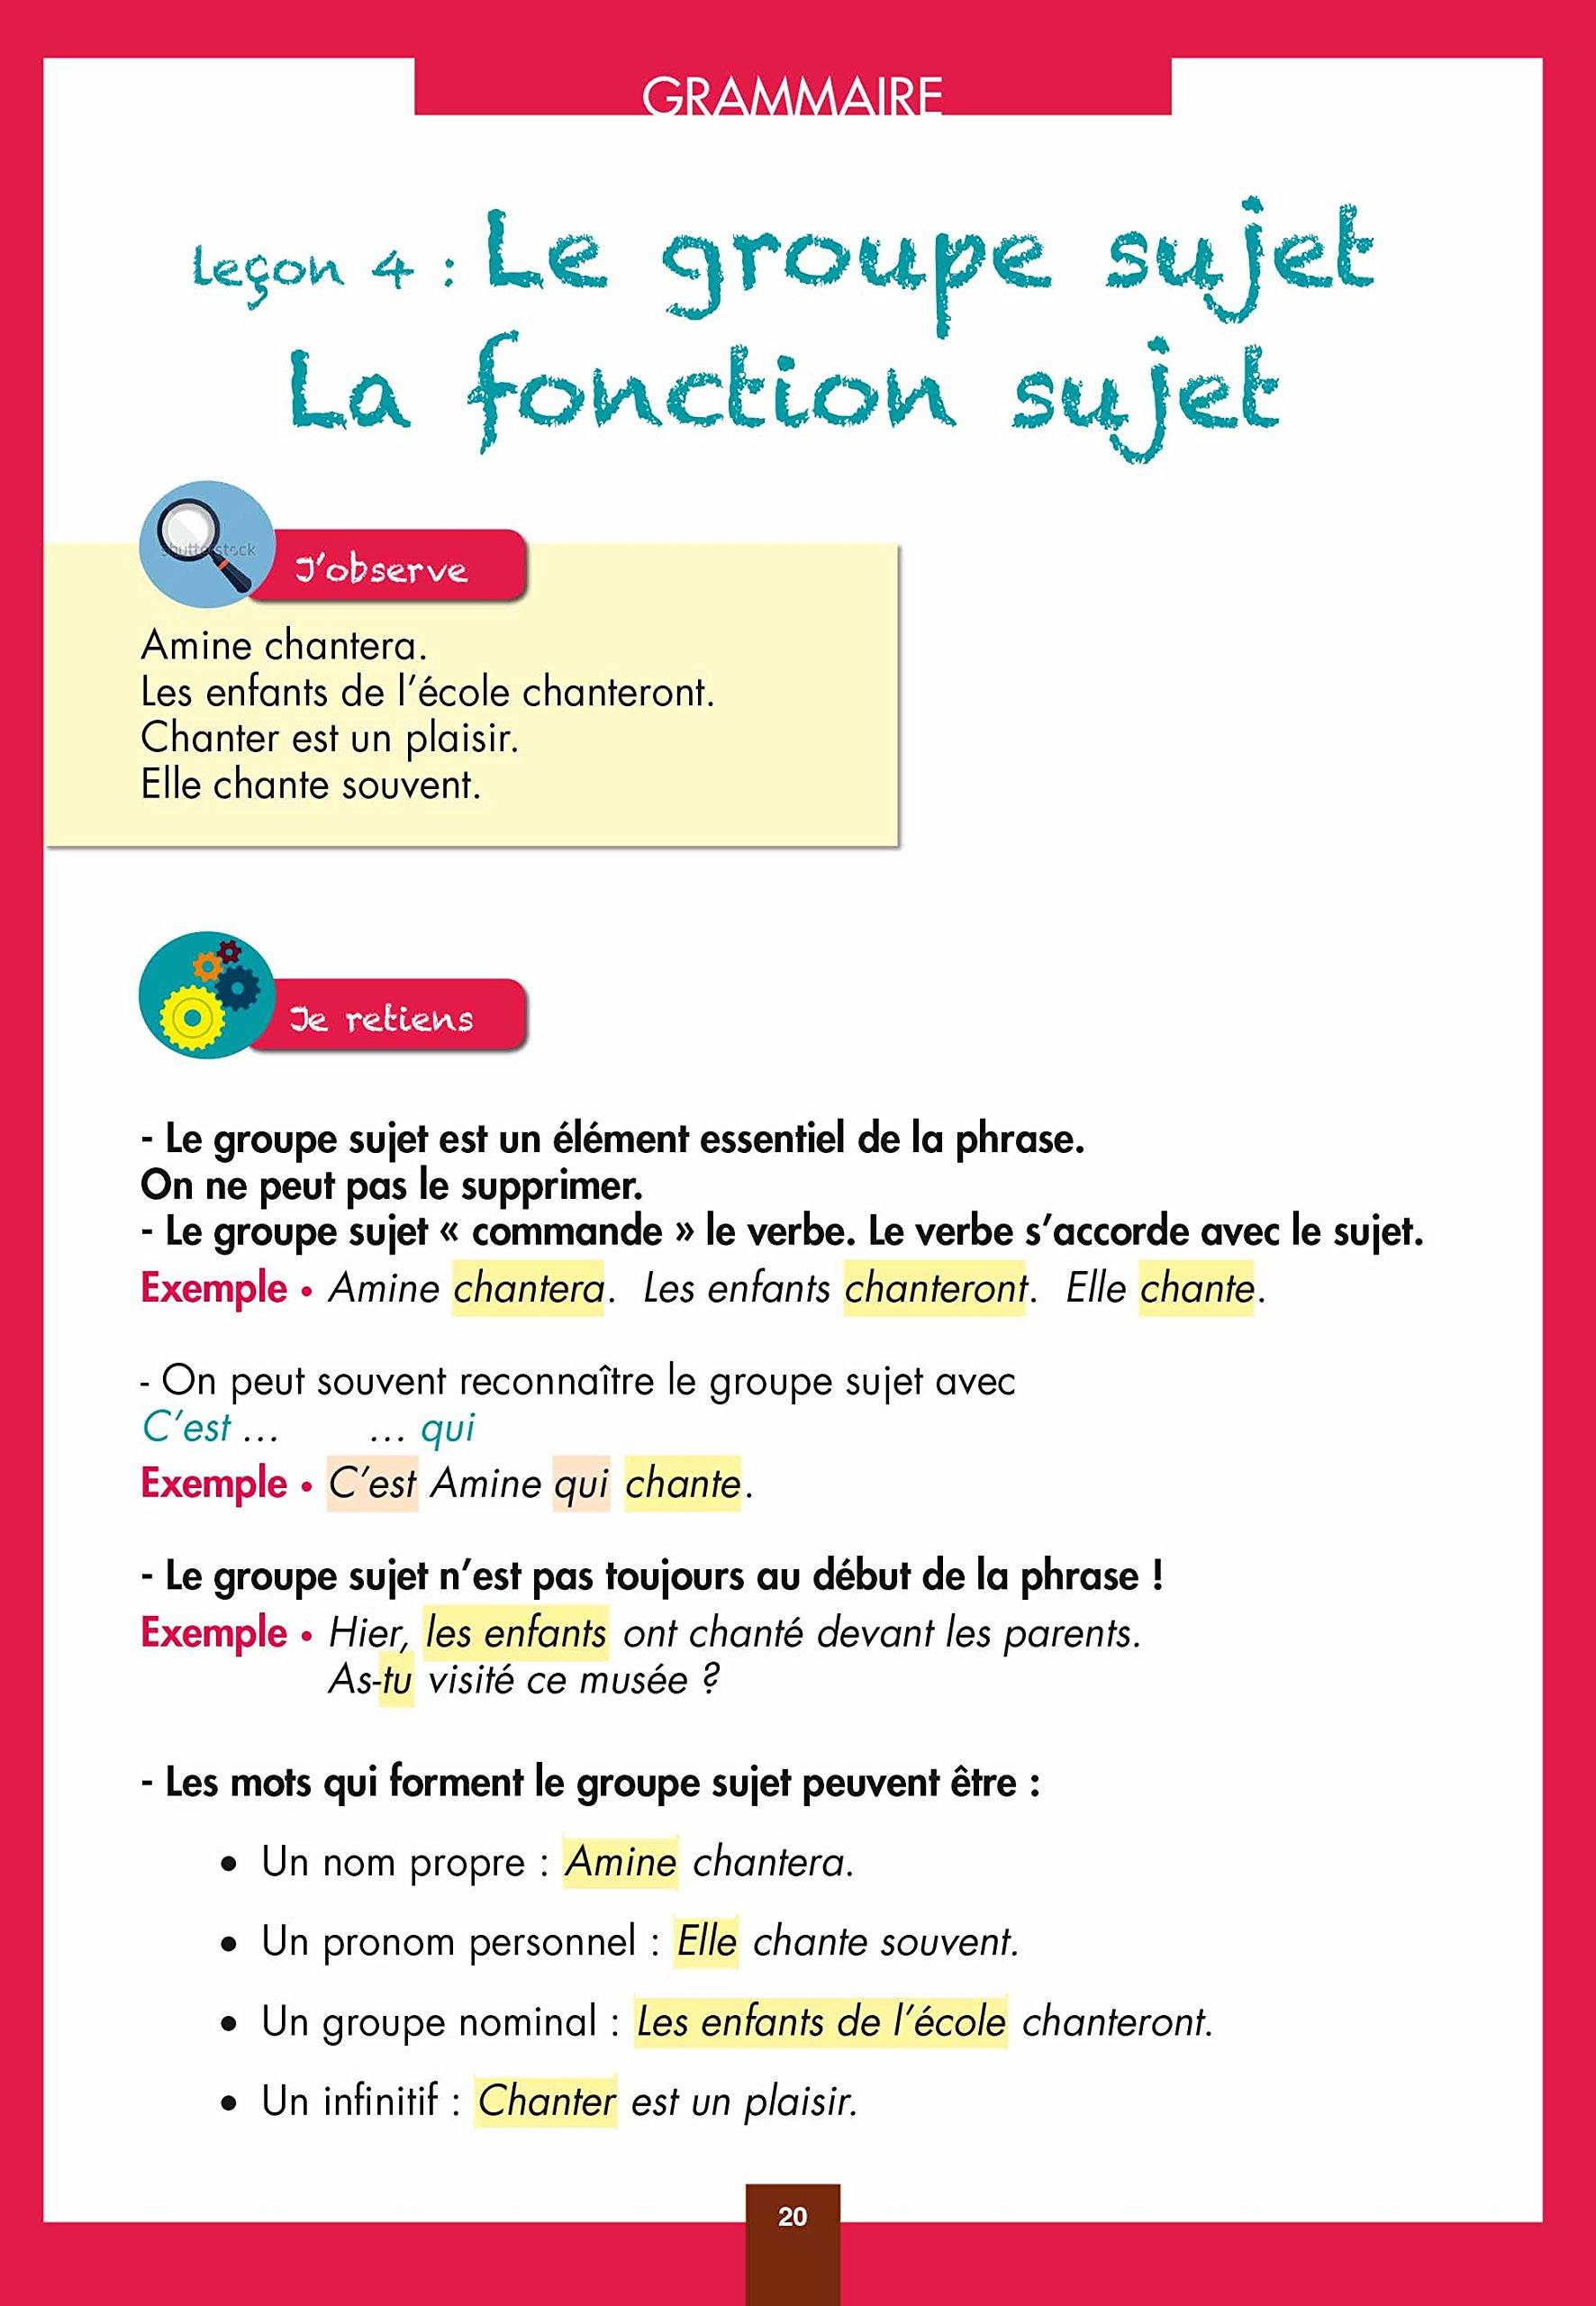 Le français au CM cest facile!: Amazon.es: Ewa Lambrechts, Serge Herreman: Libros en idiomas extranjeros